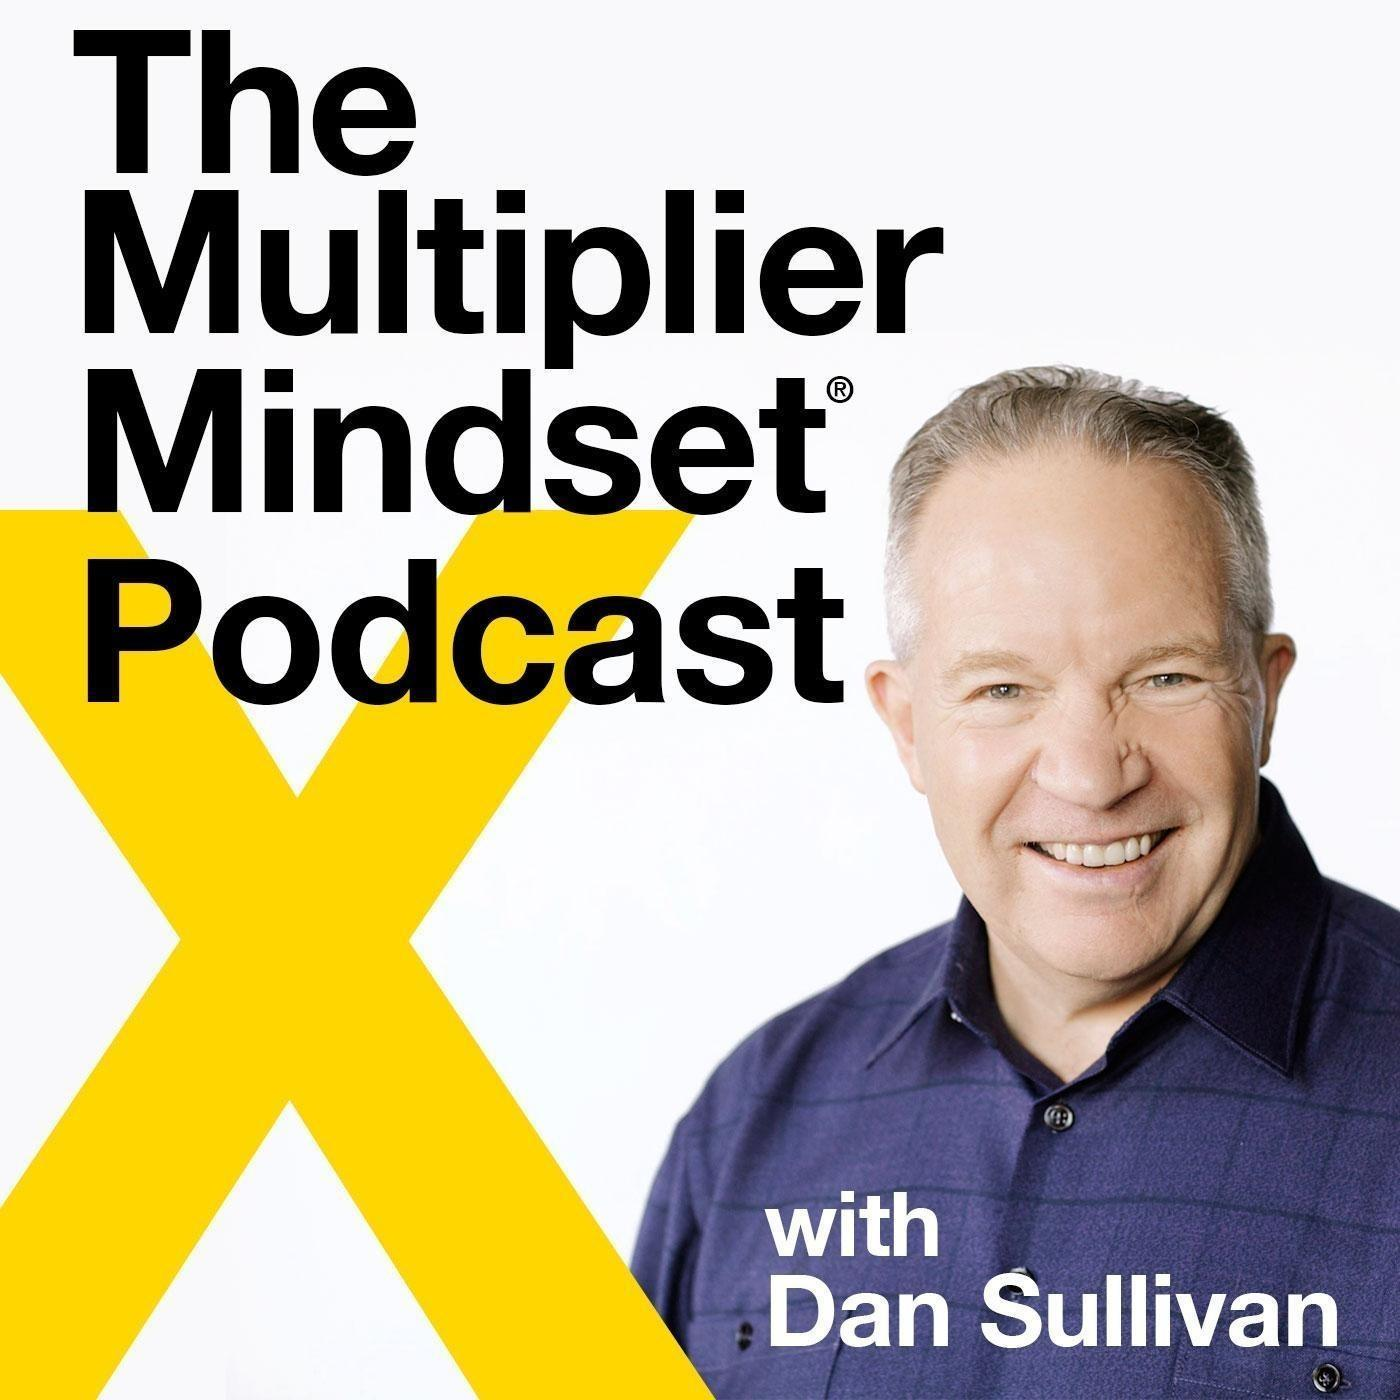 The Multiplier Mindset® Podcast with Dan Sullivan